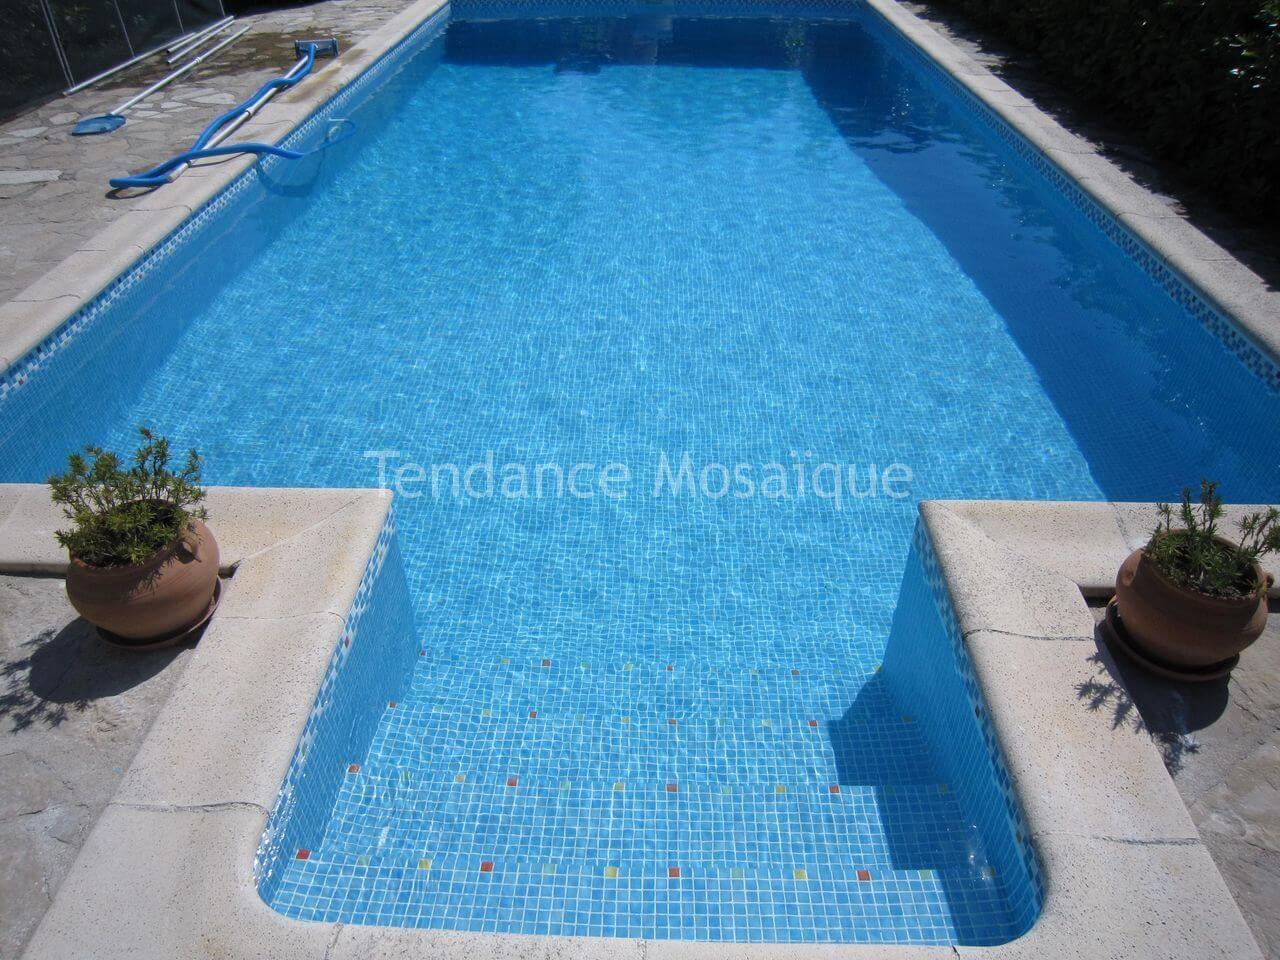 carrelage piscine r alis avec maux de verre ezarri 2508a. Black Bedroom Furniture Sets. Home Design Ideas